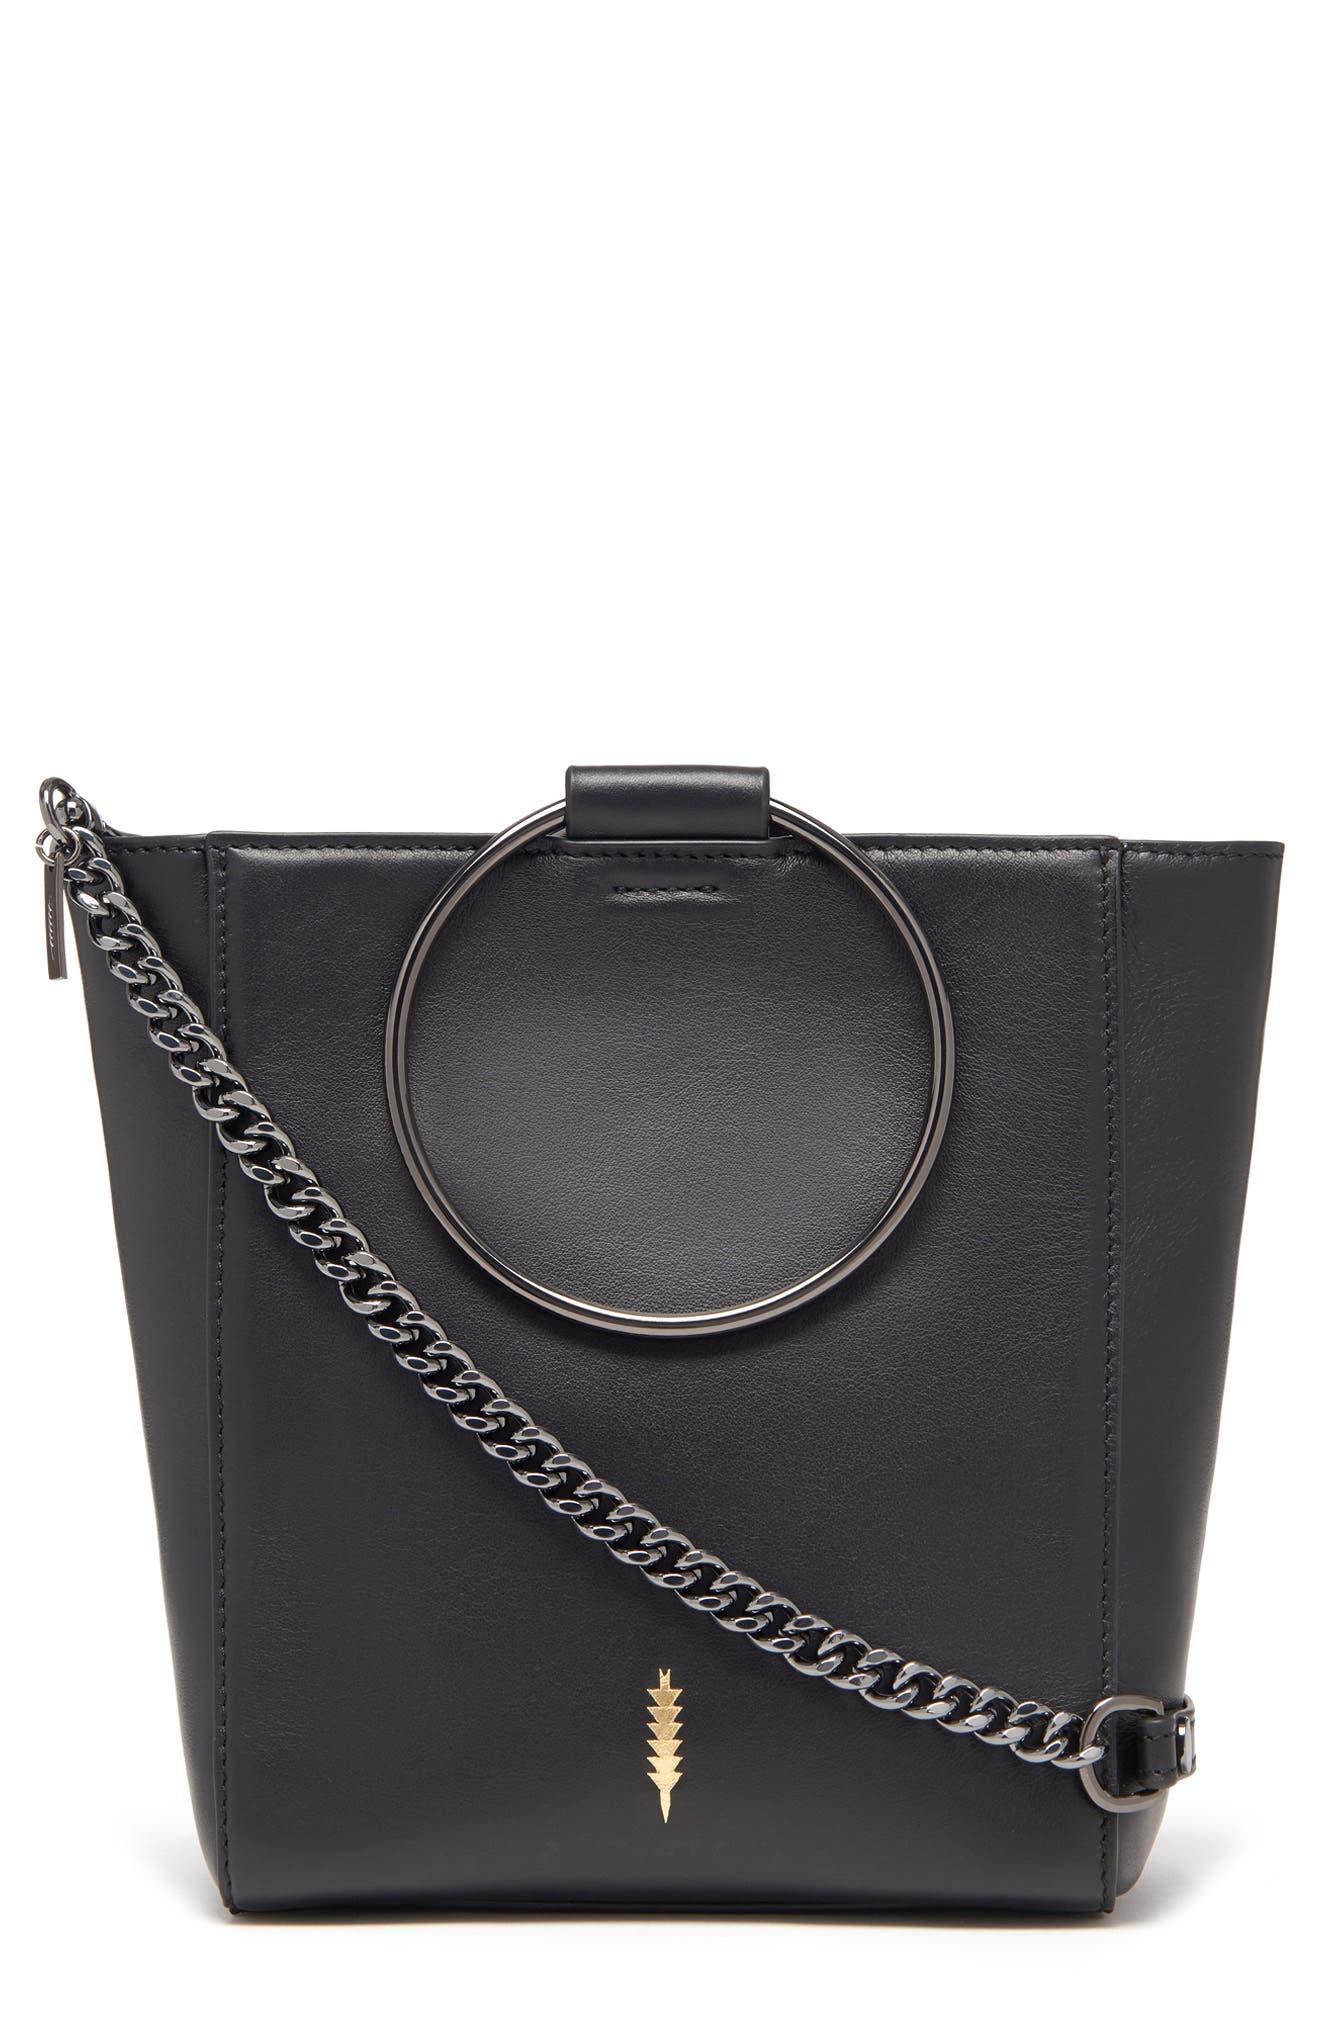 THACKER,                             Le Bucket Leather Bag,                             Main thumbnail 1, color,                             BLACK/ GUNMETAL